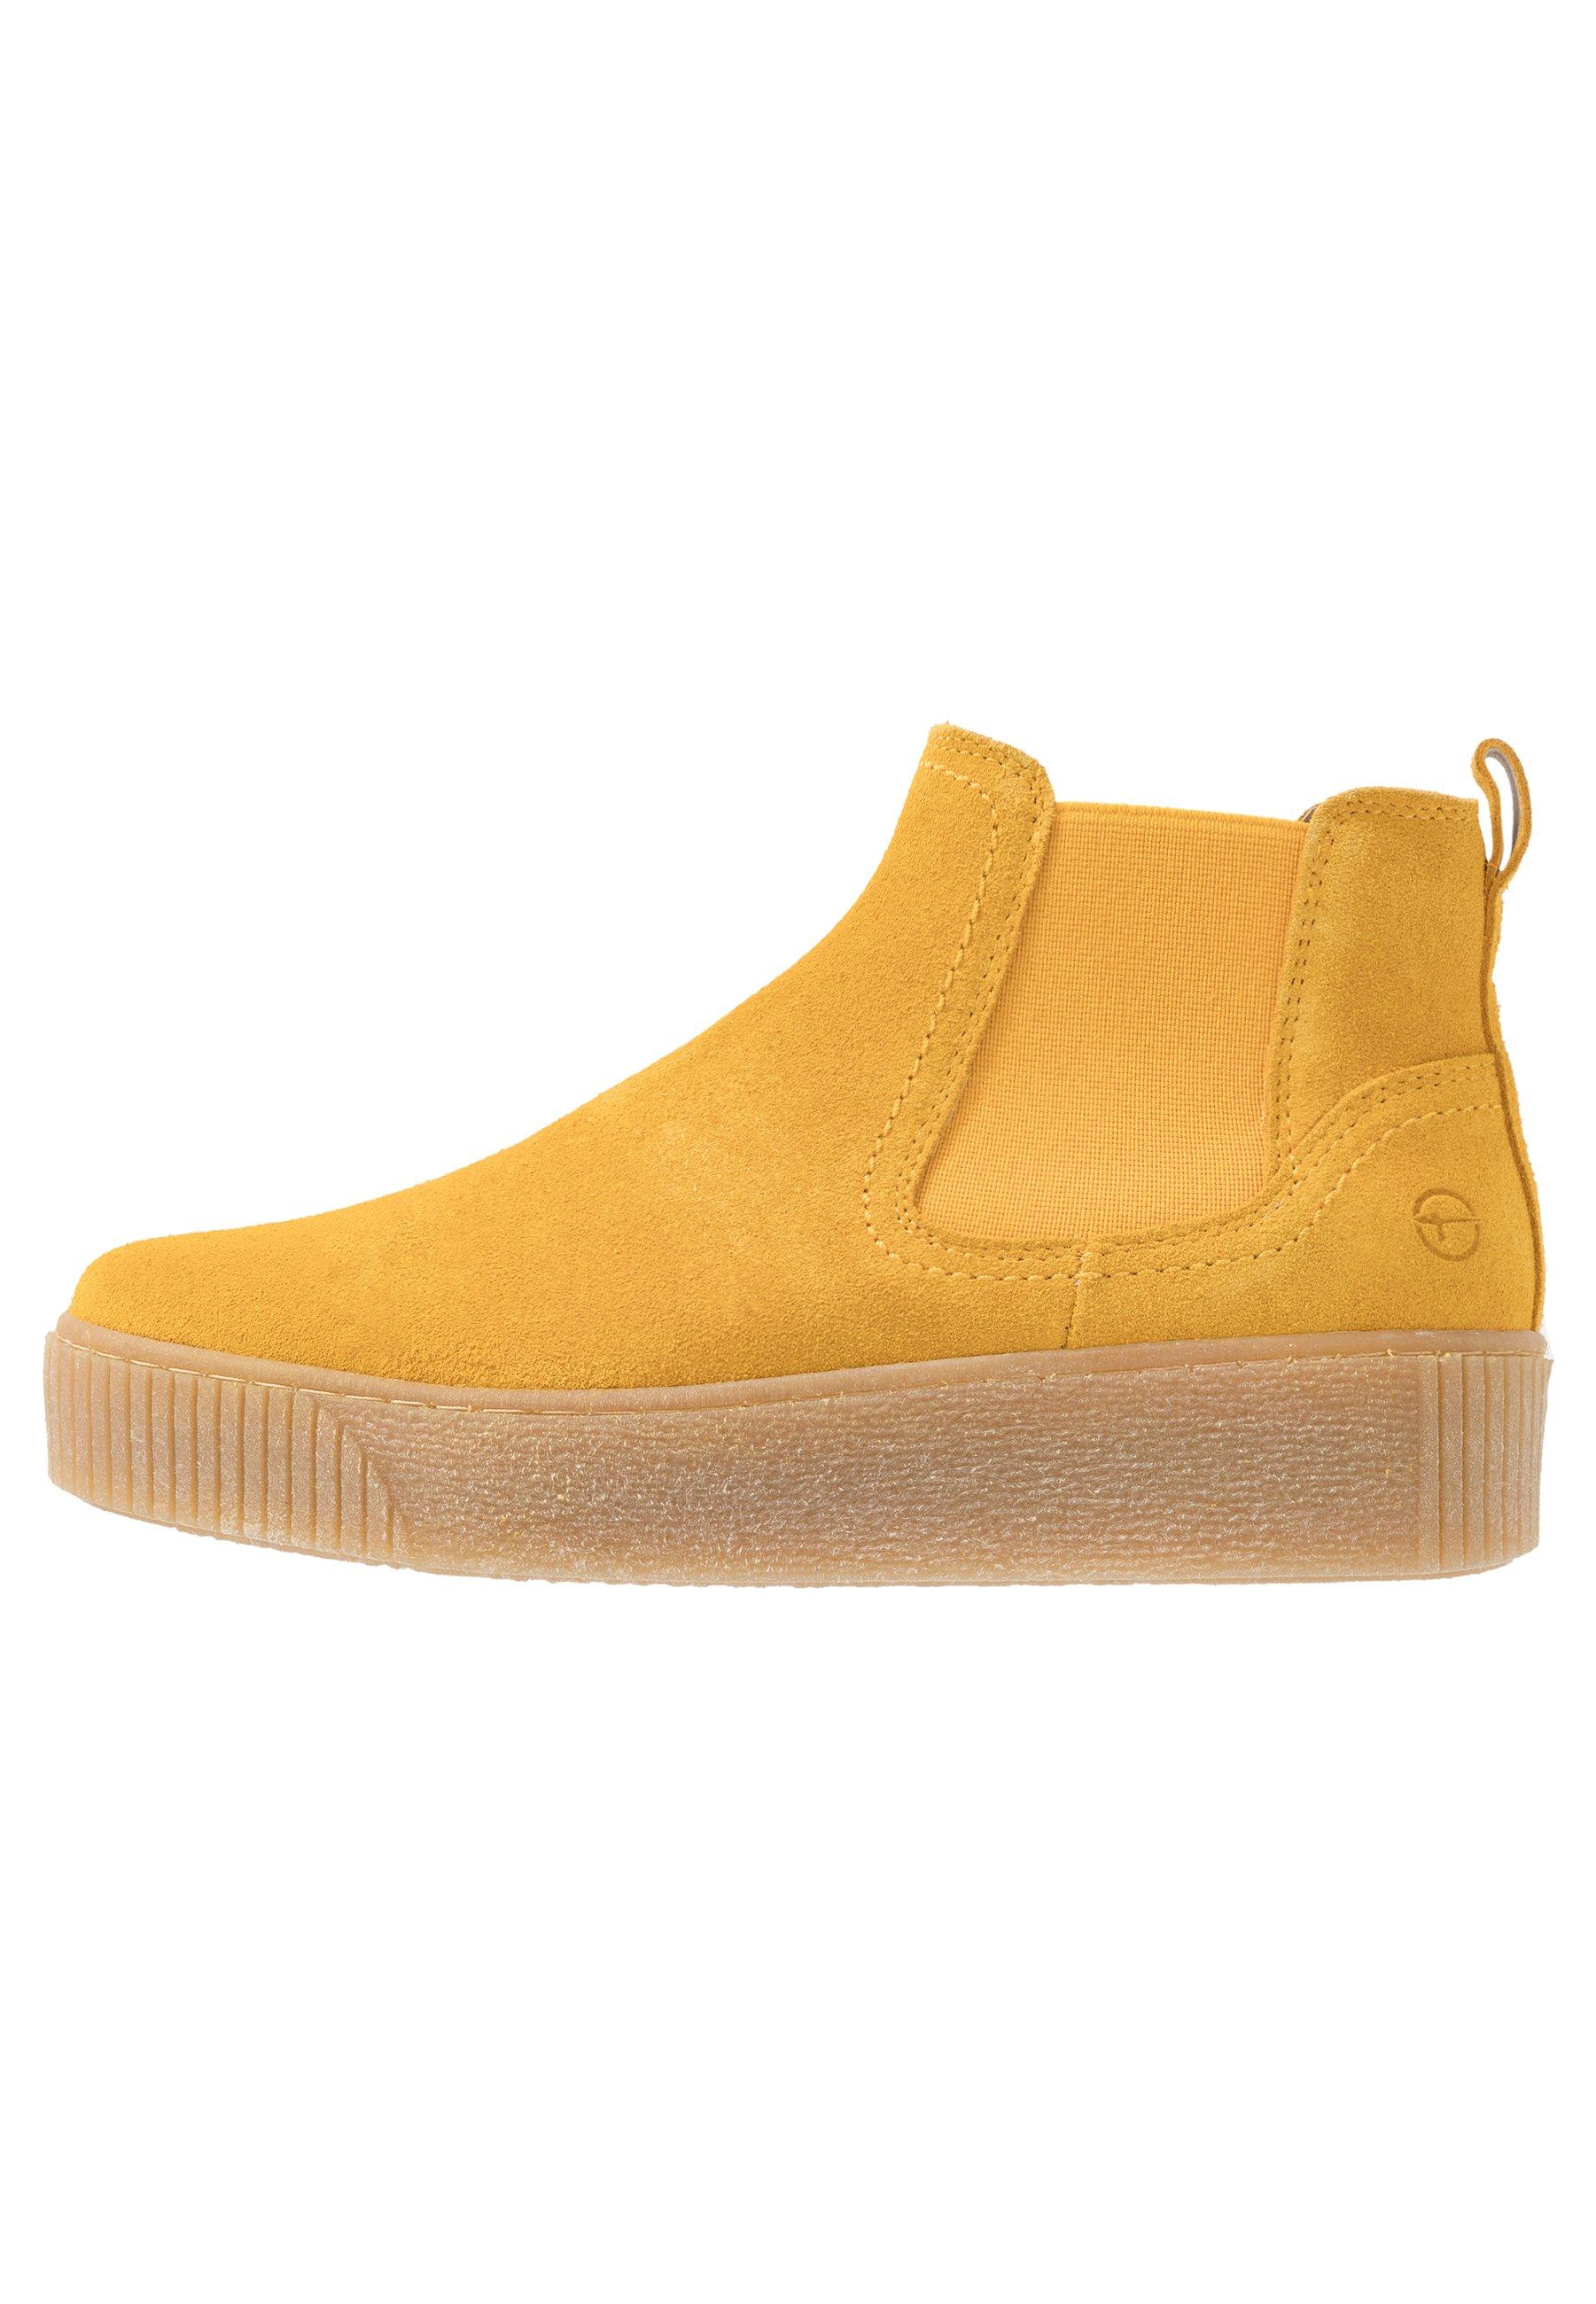 Tamaris Ankle Boot - Sapphire/royal